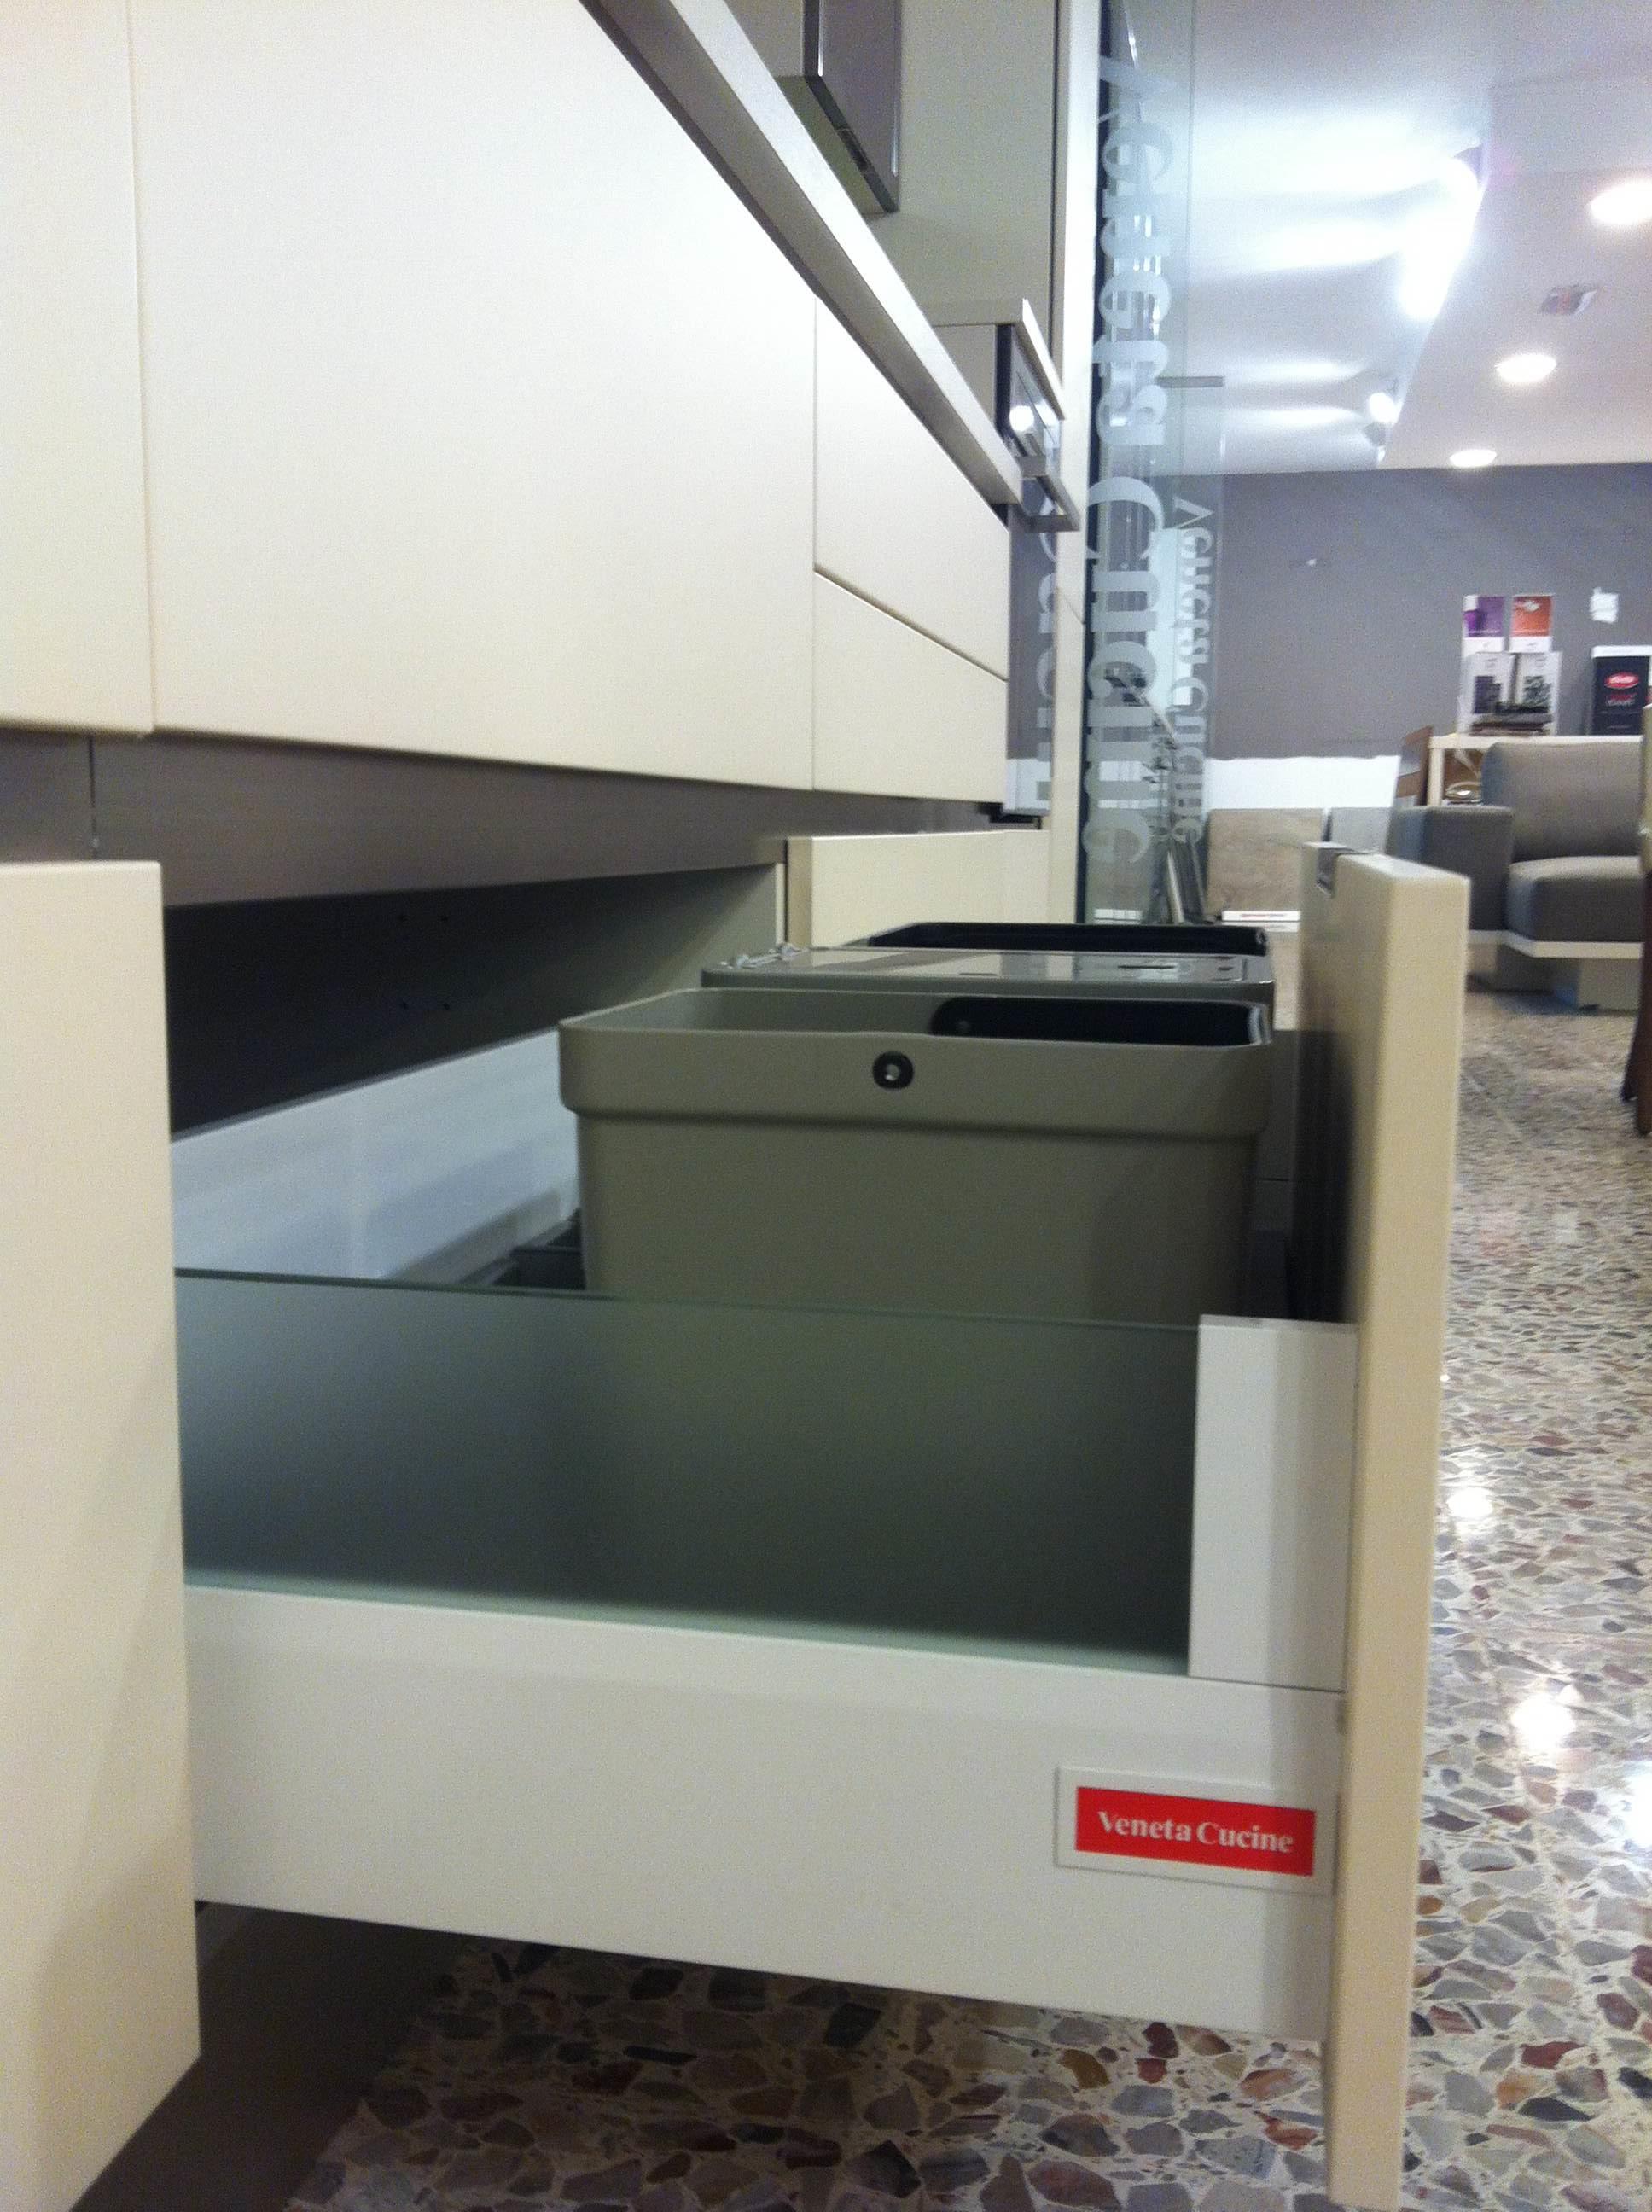 Cucina veneta cucine extra go moderna laccato opaco cucine a prezzi scontati - Scavolini o veneta cucine ...